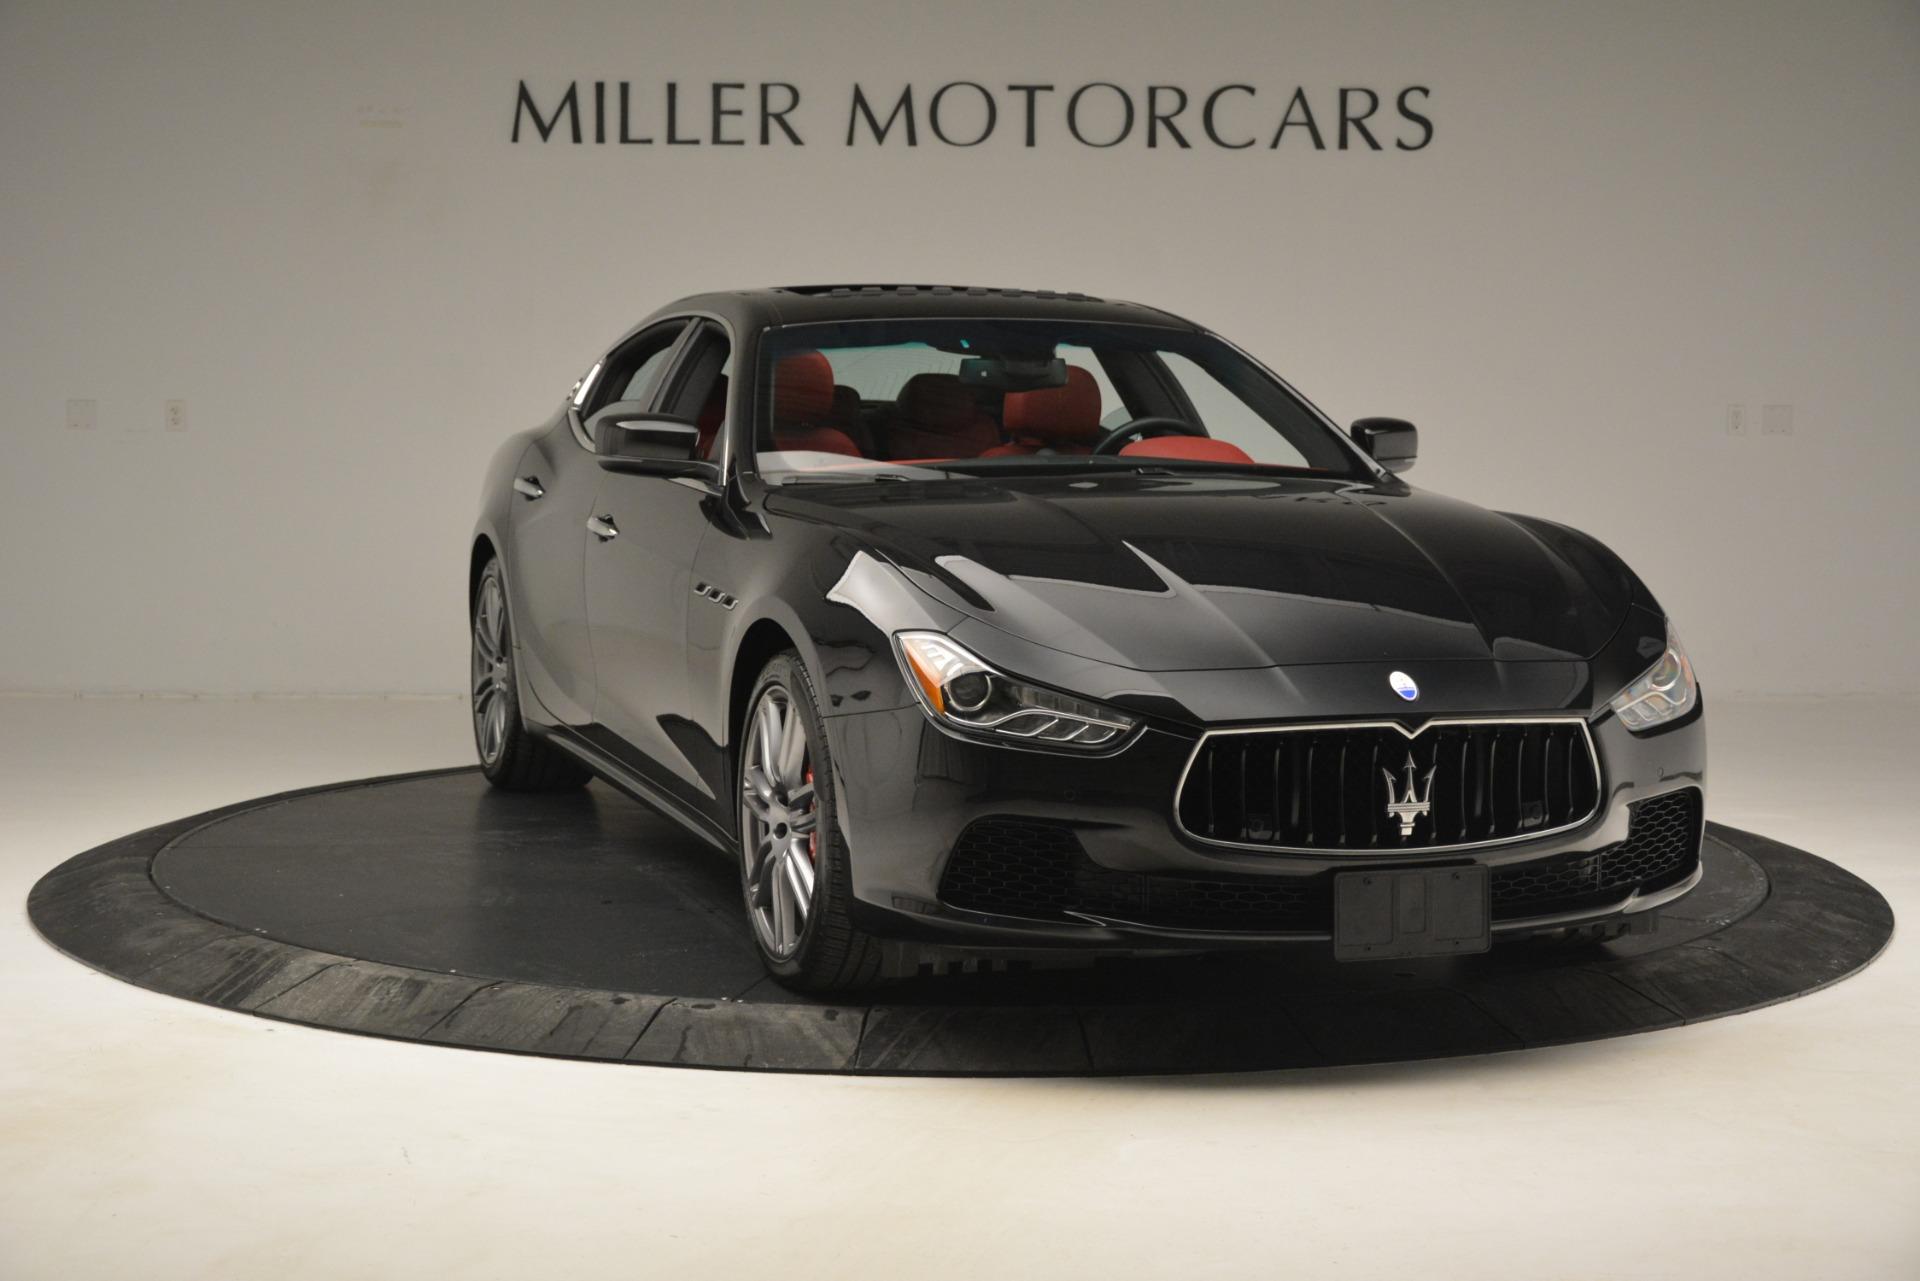 Used 2016 Maserati Ghibli S Q4 For Sale In Greenwich, CT. Alfa Romeo of Greenwich, 7478 2945_p14